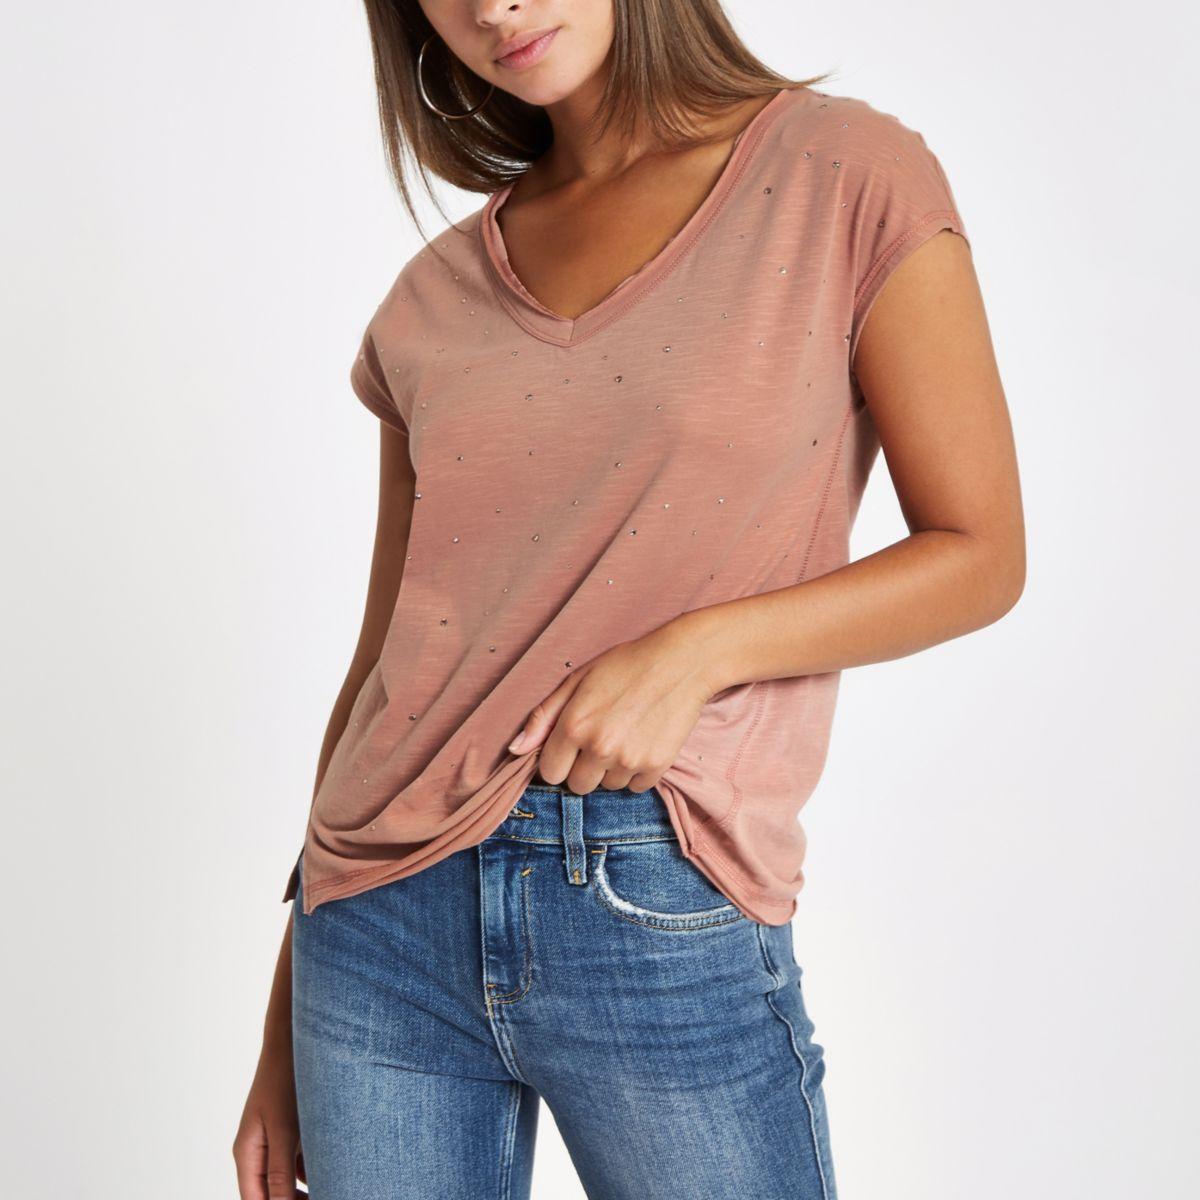 Pink rhinestone embellished T-shirt